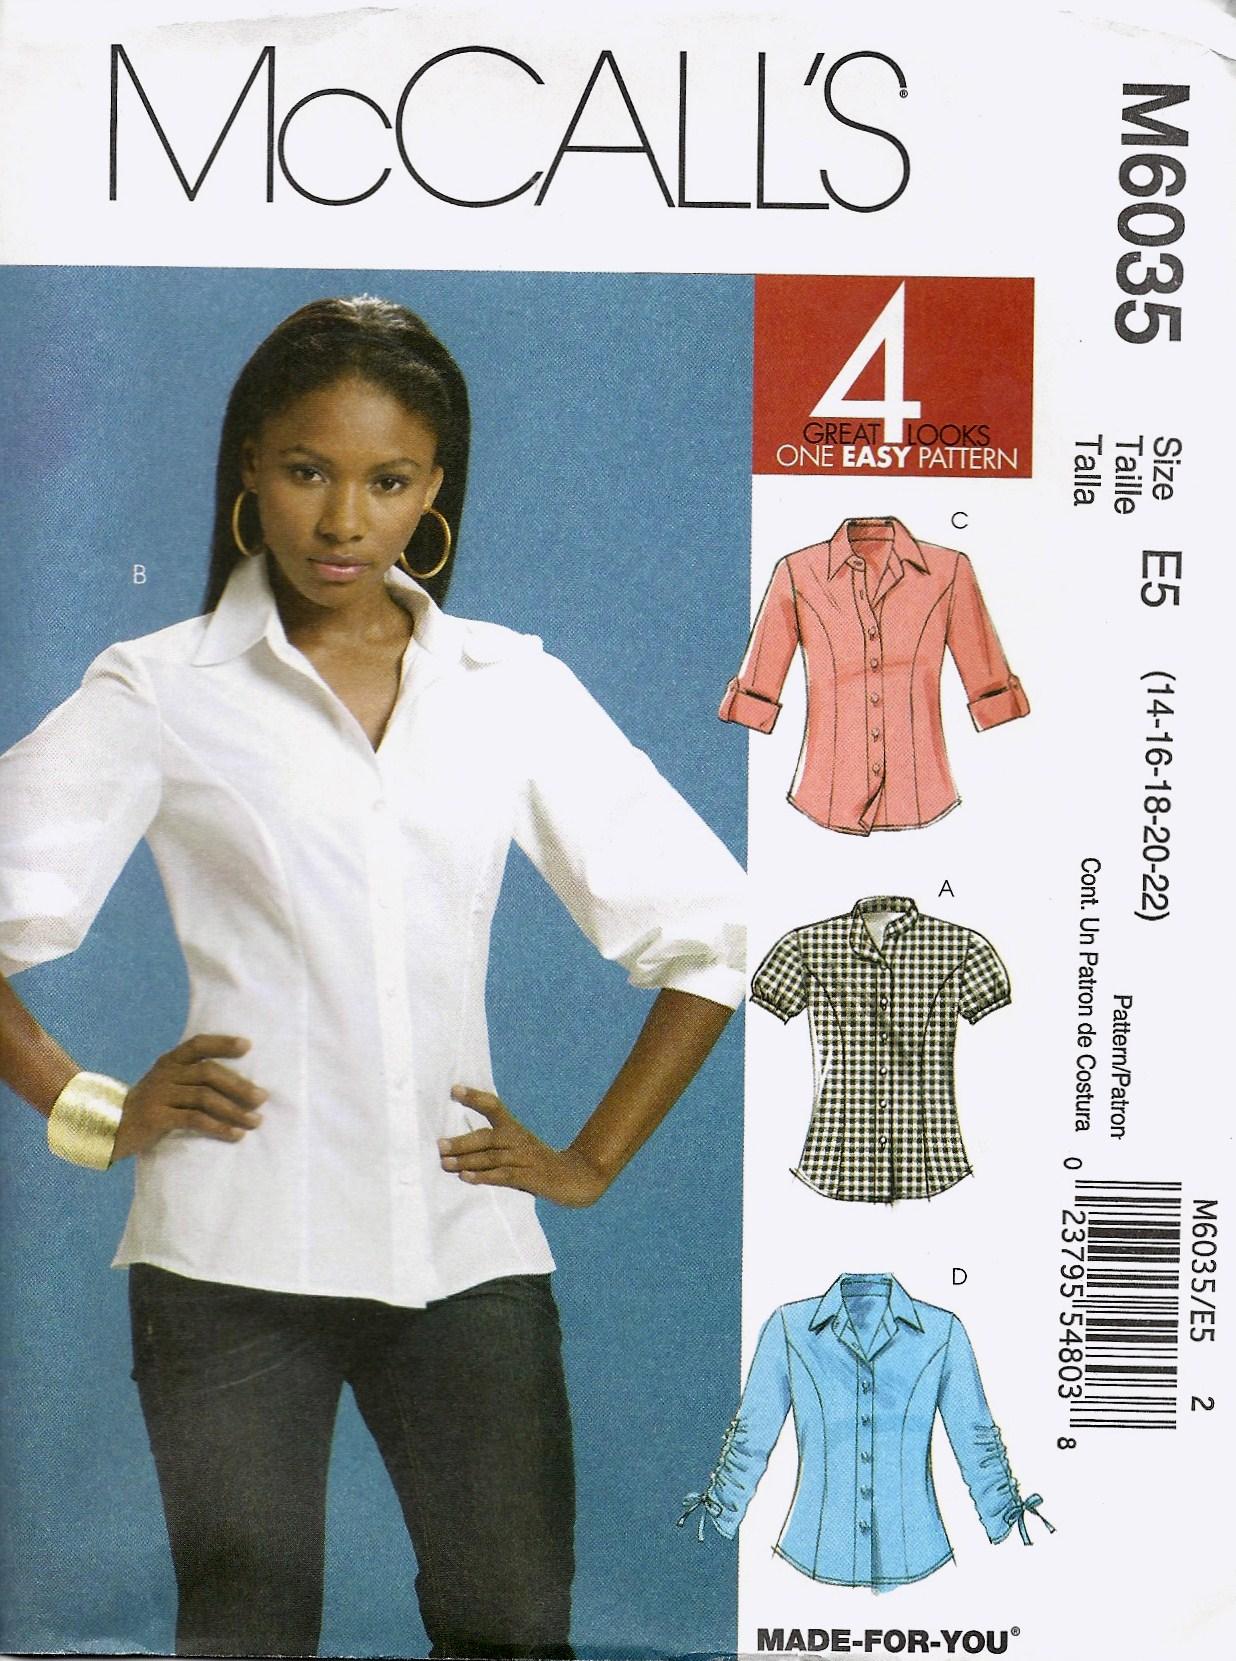 McCalls 6035 Pattern Review - Maree Pigdon | Sewing Blog